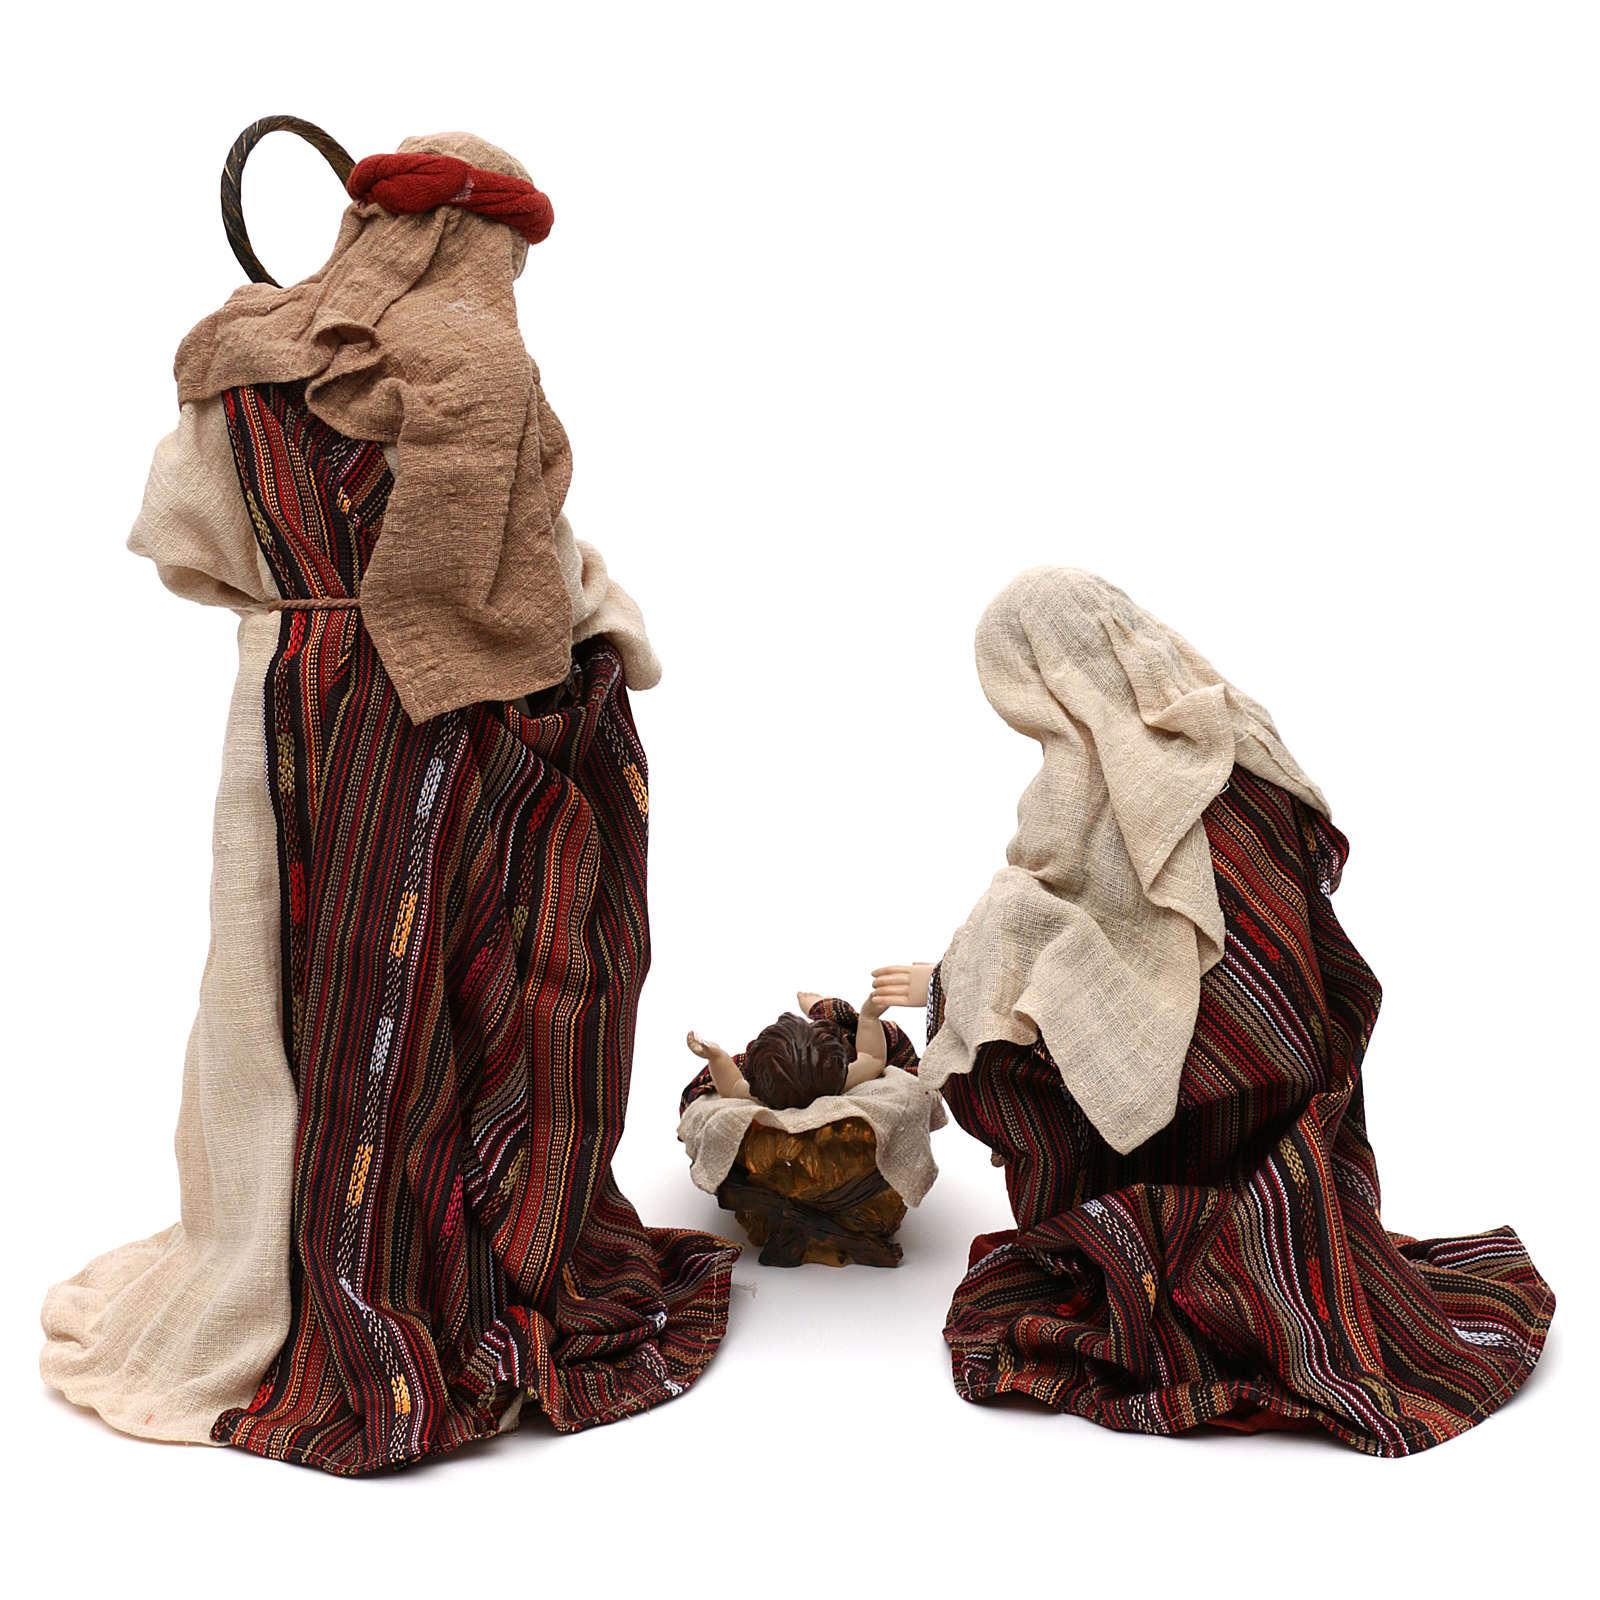 Sacra Famiglia stile orientale vesti pregiate resina colorata 42 cm 3